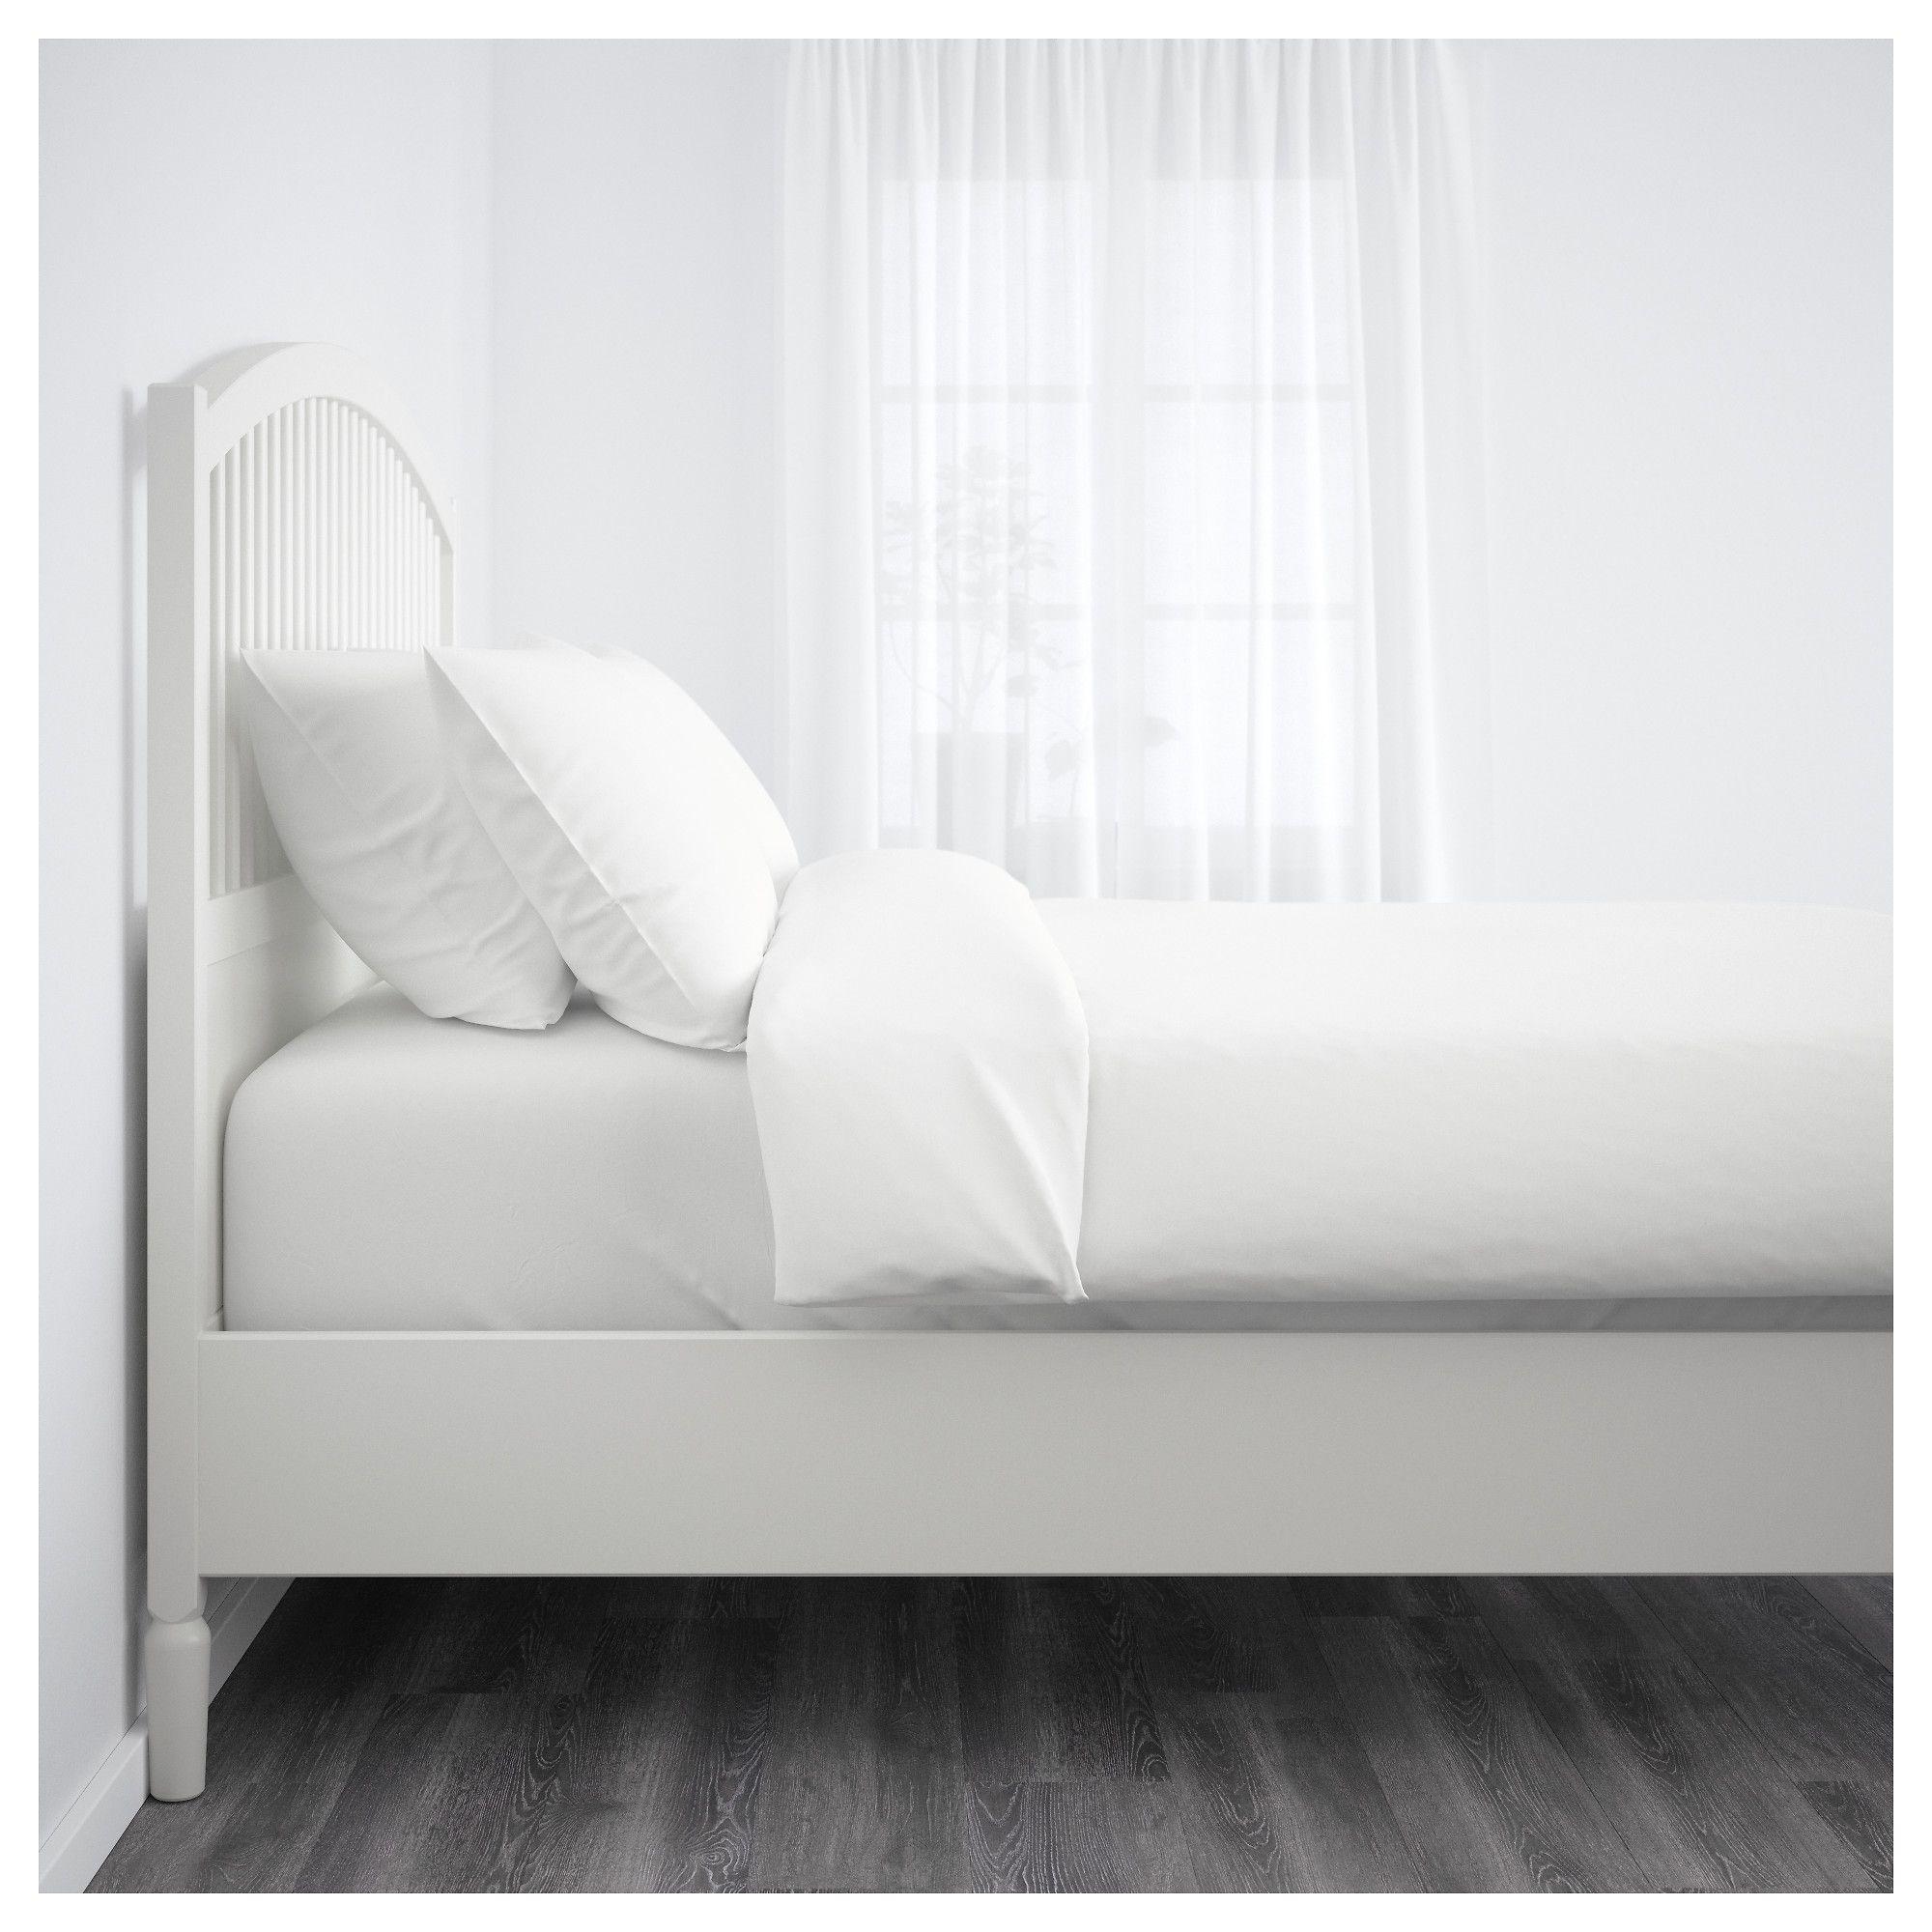 Tyssedal Bed Frame White Lönset Products Pinterest Bed Frame